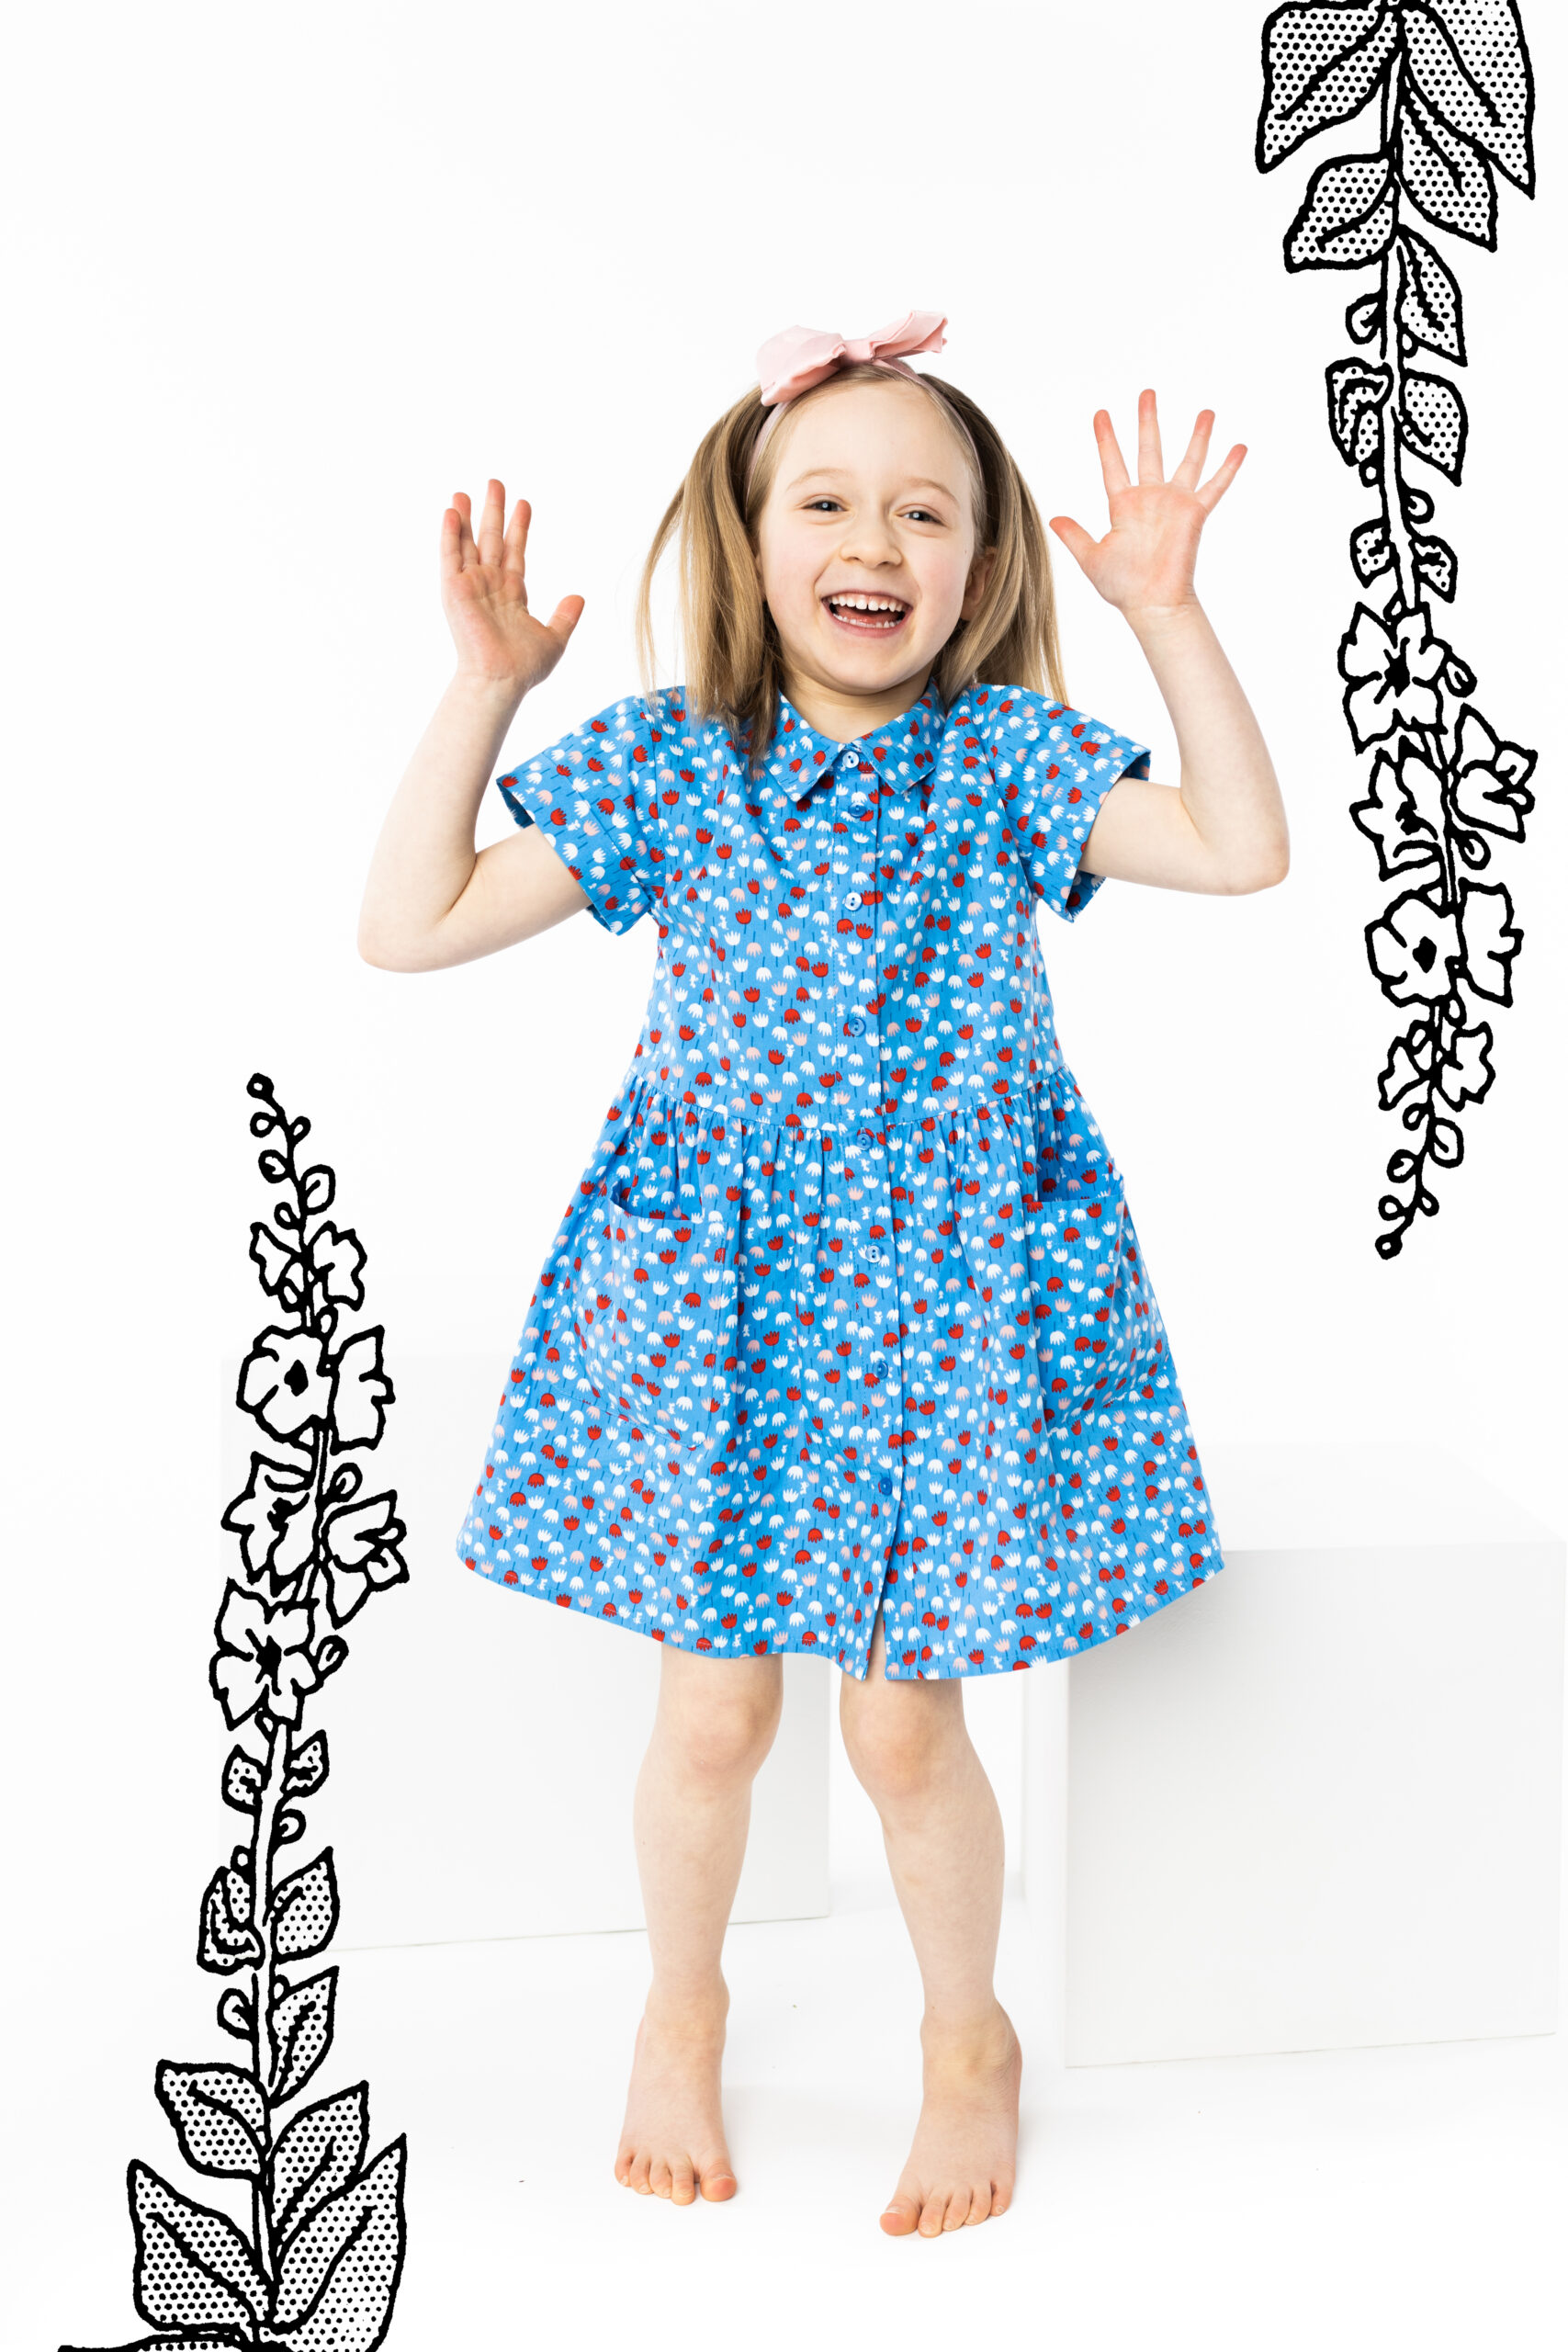 Martinex Moomin Miniflower Dress Blue